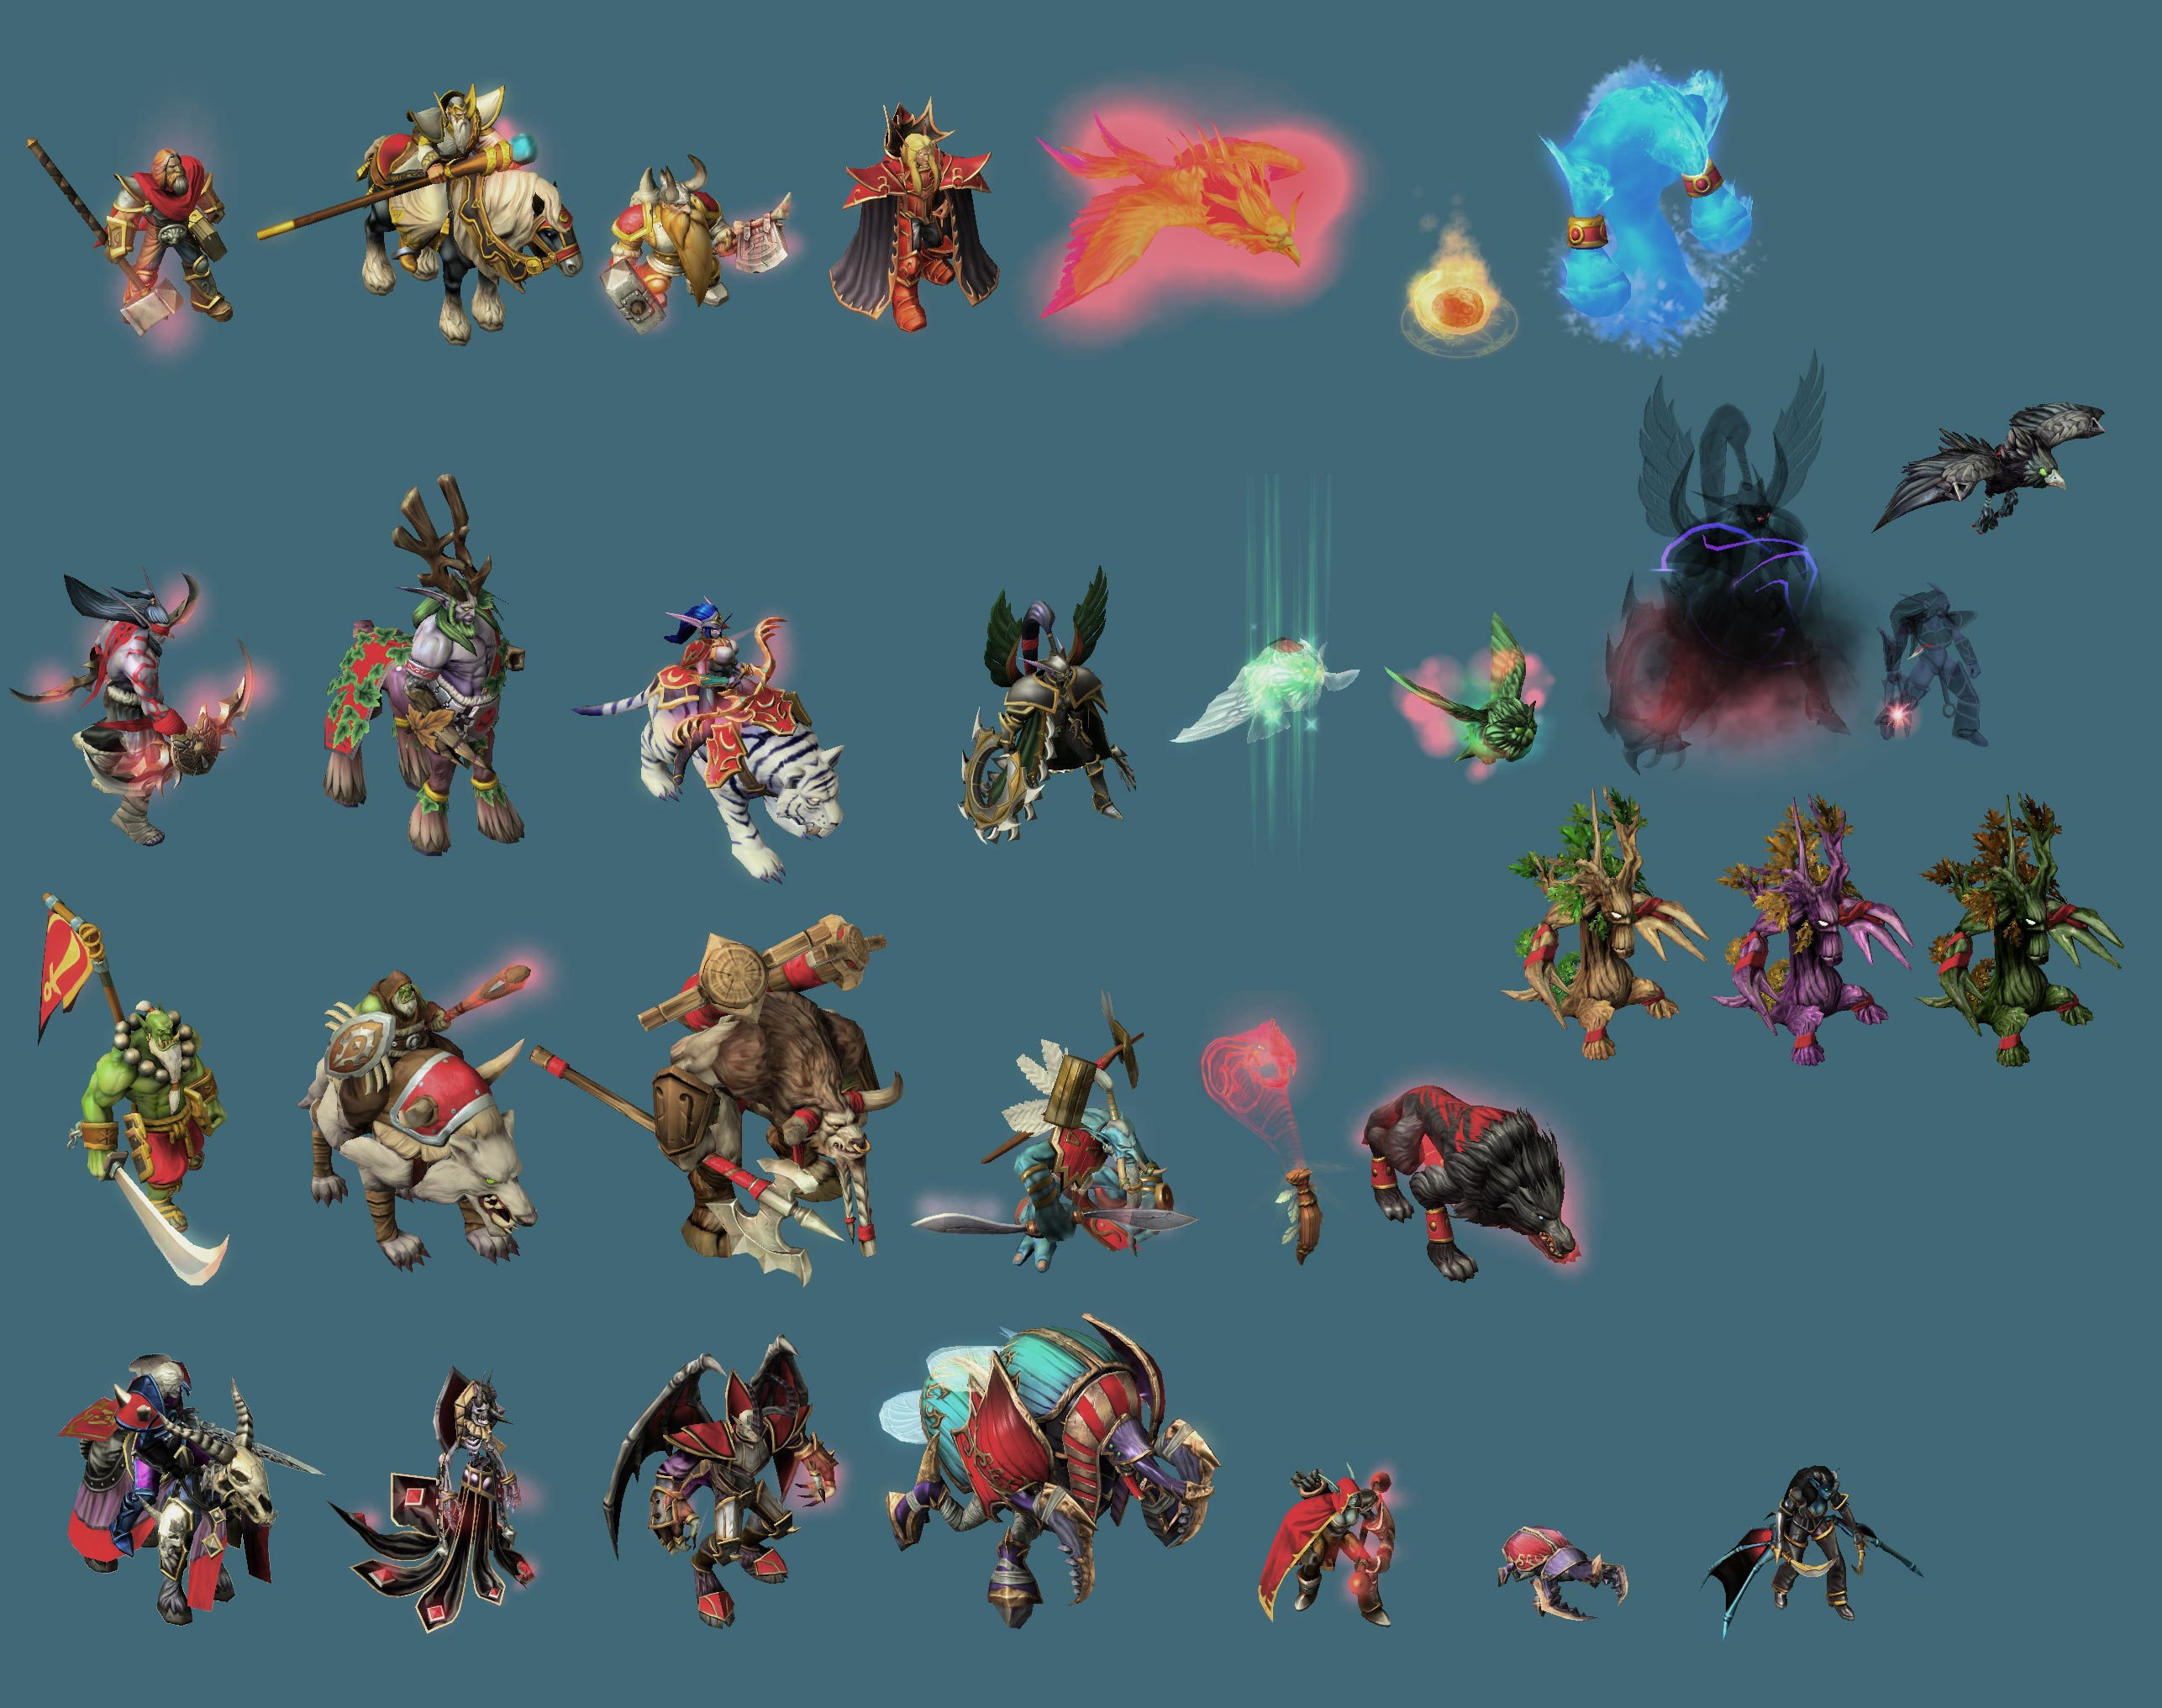 Вопросы - WarCraft 3 / Модмейкинг - XGM: Xtream Game Modmaking